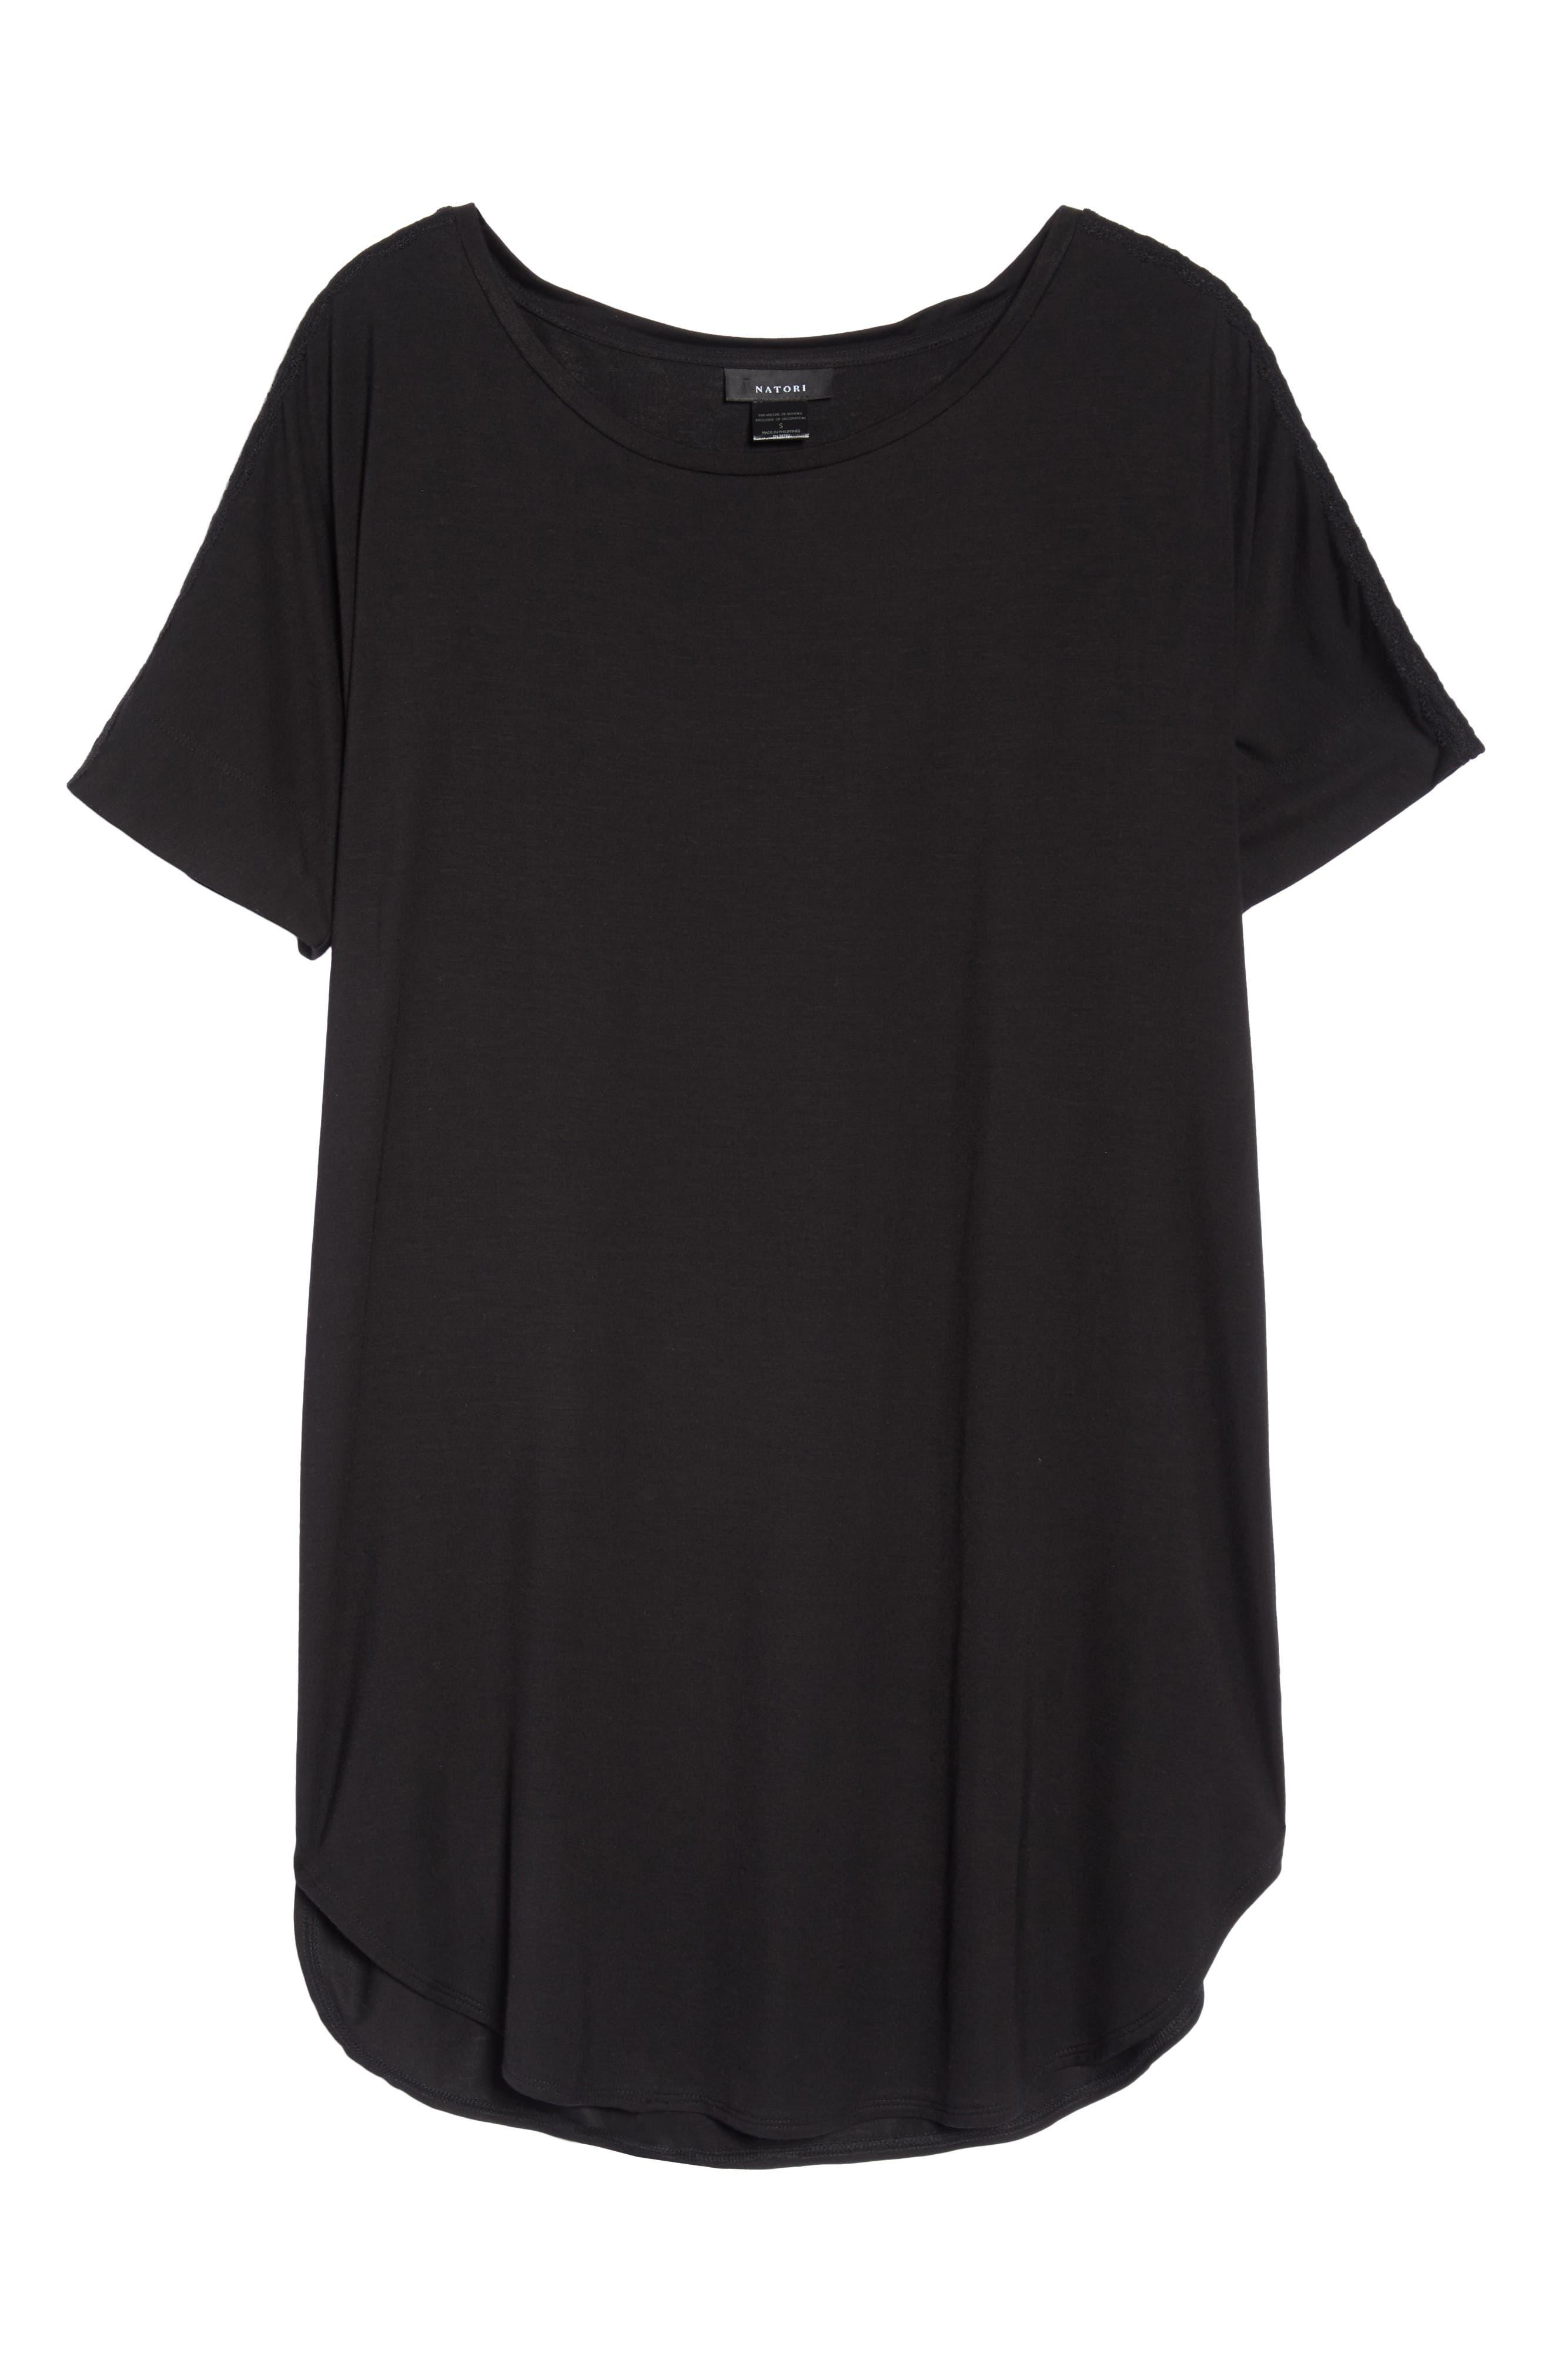 NATORI, Feathers Essential Sleep Shirt, Alternate thumbnail 6, color, BLACK